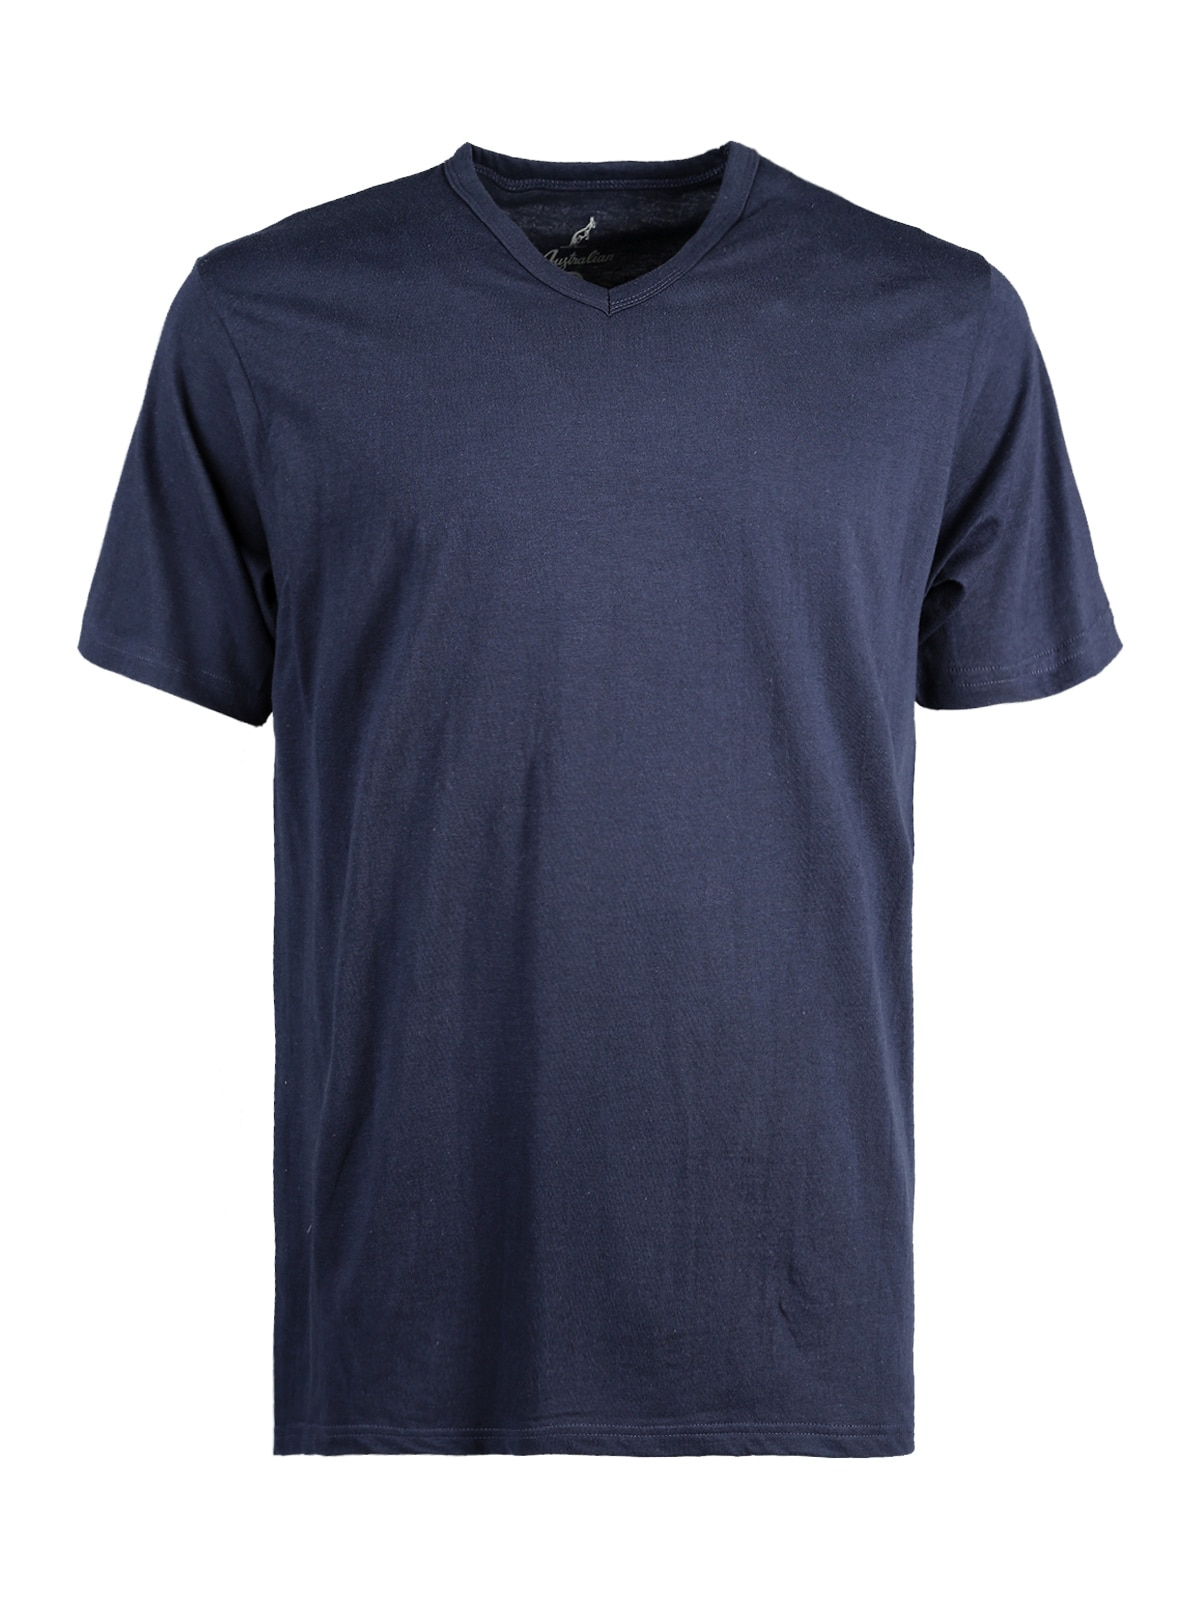 Camiseta de manga corta con cuello en V